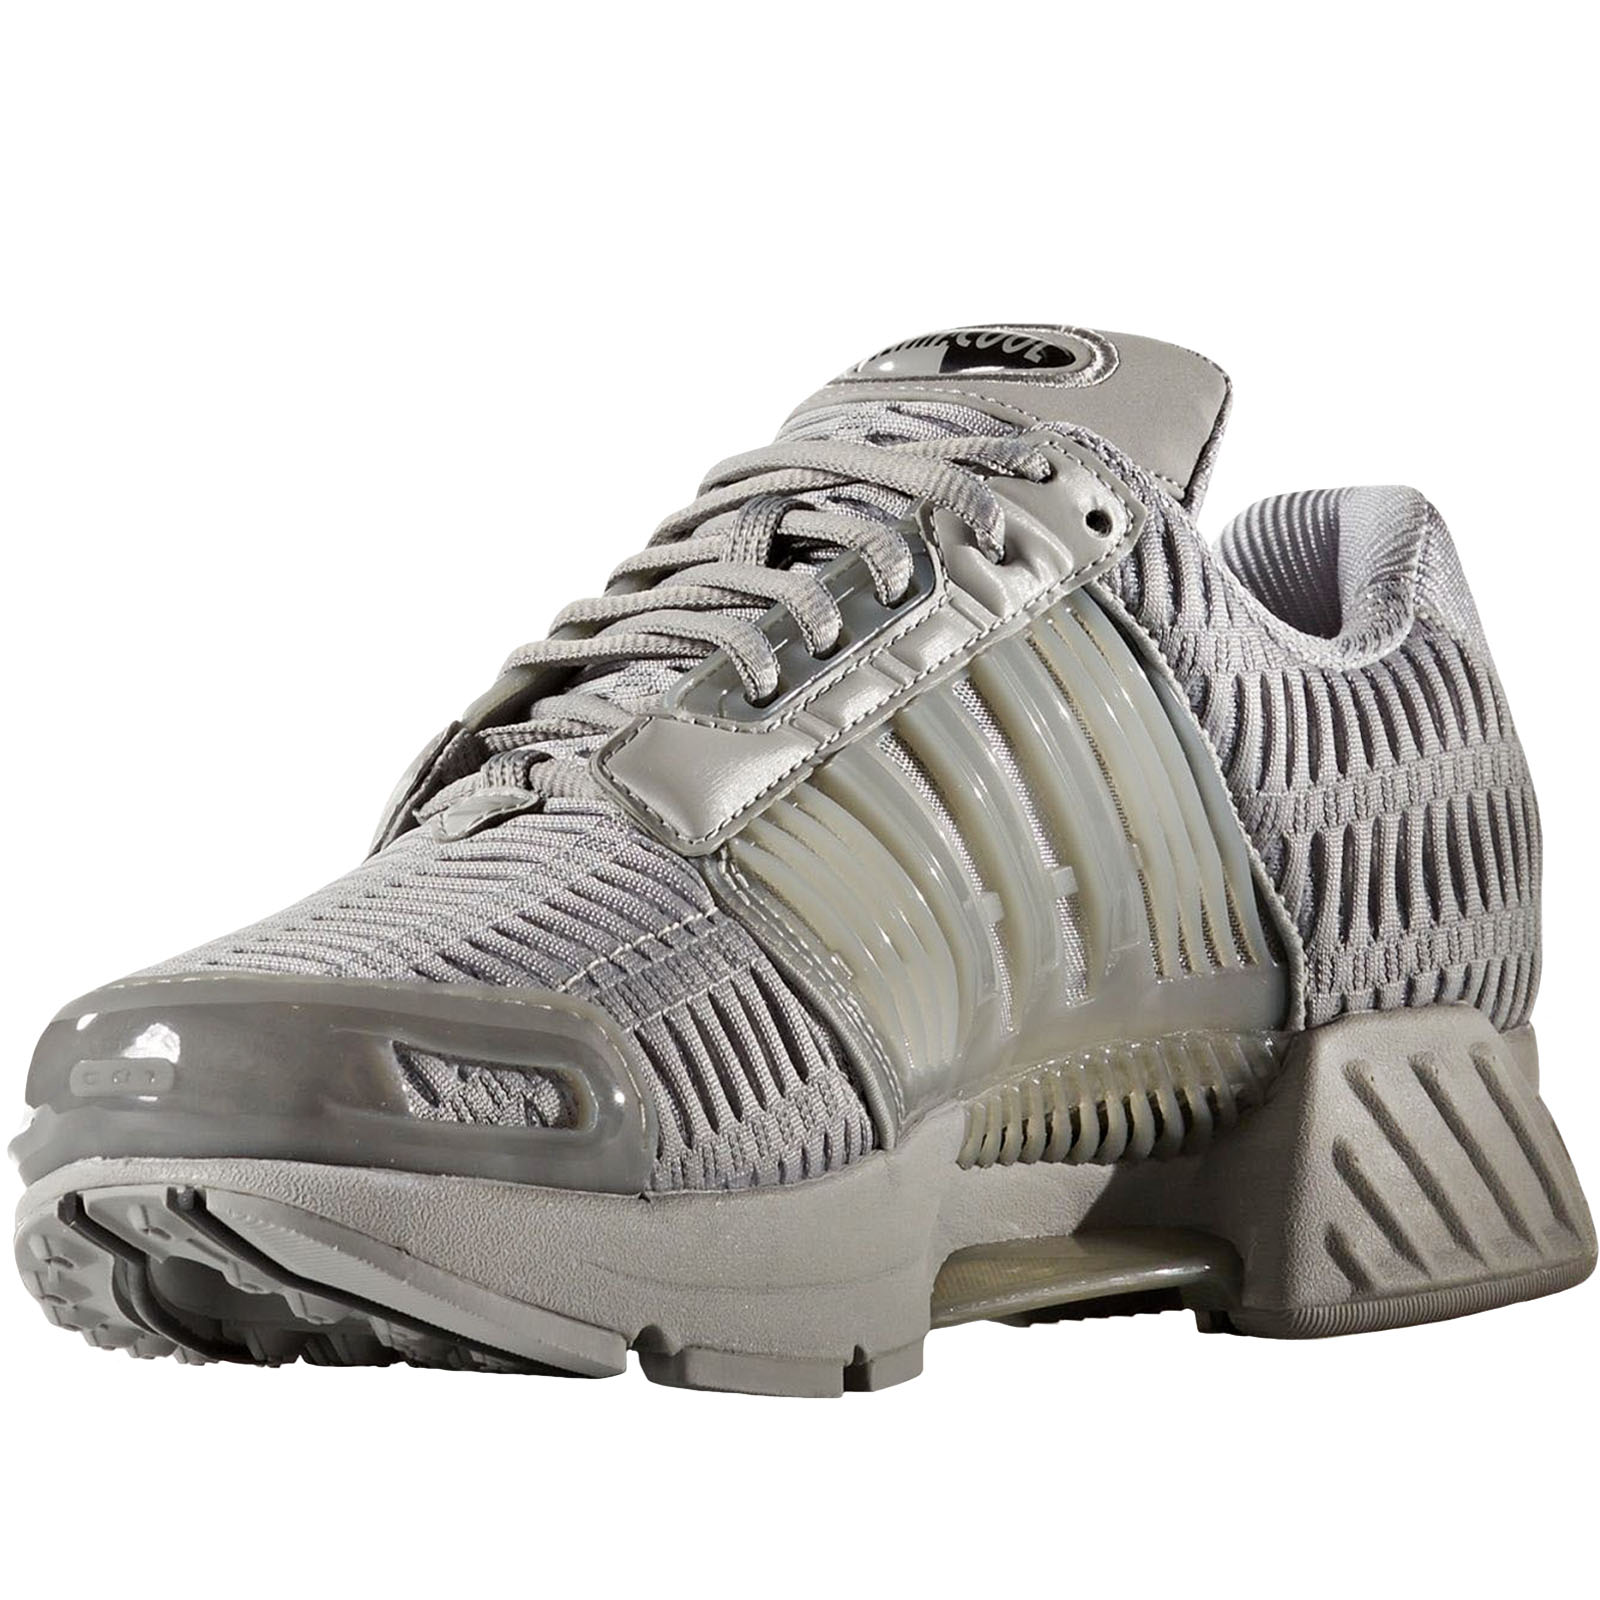 sports shoes cdb6d fb6e5 Details zu Adidas Originals Herren Clima Cool 1 Schnürer Freizeit  Turnschuhe Schuhe